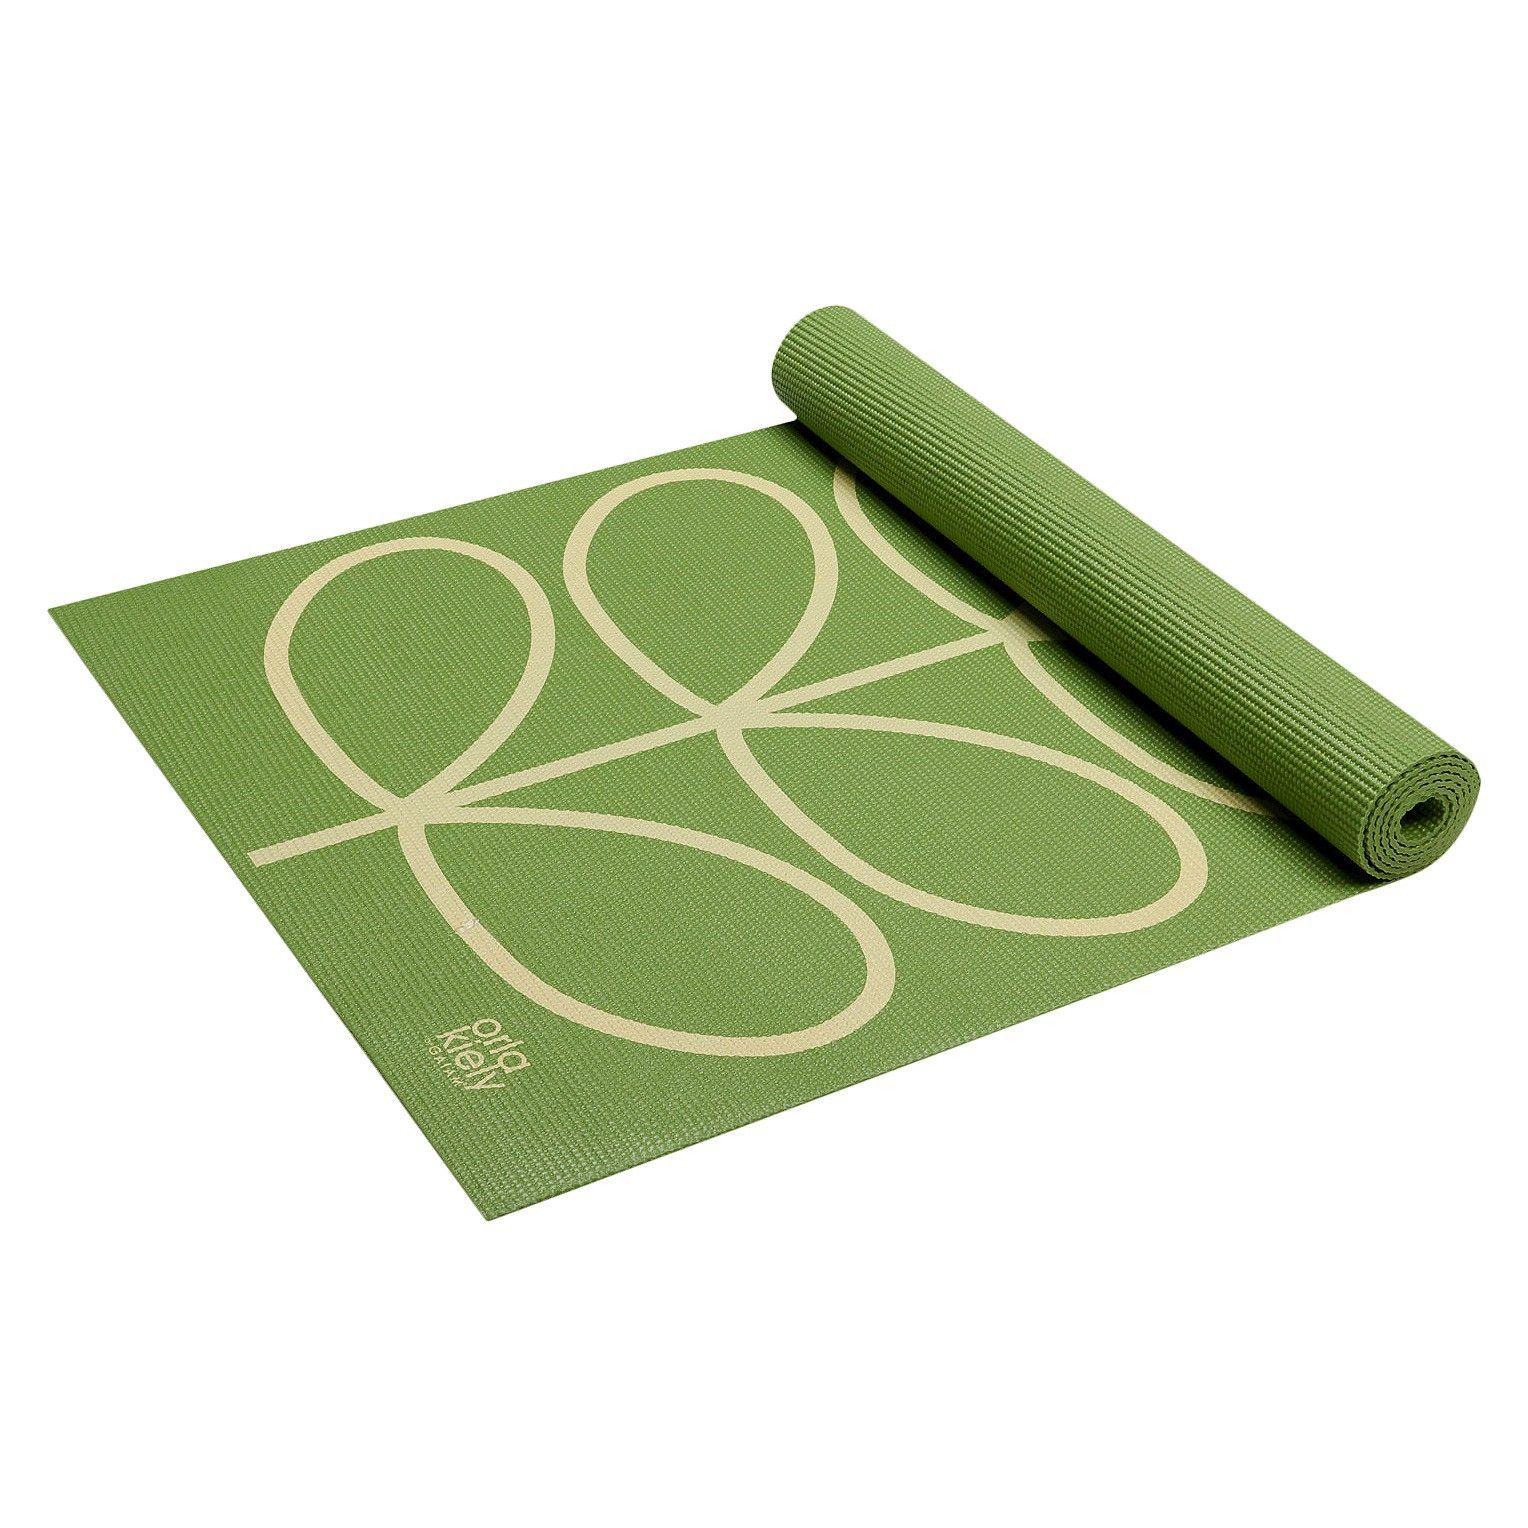 Orla kiely by gaiam linear stem apple yoga mat : target gifts